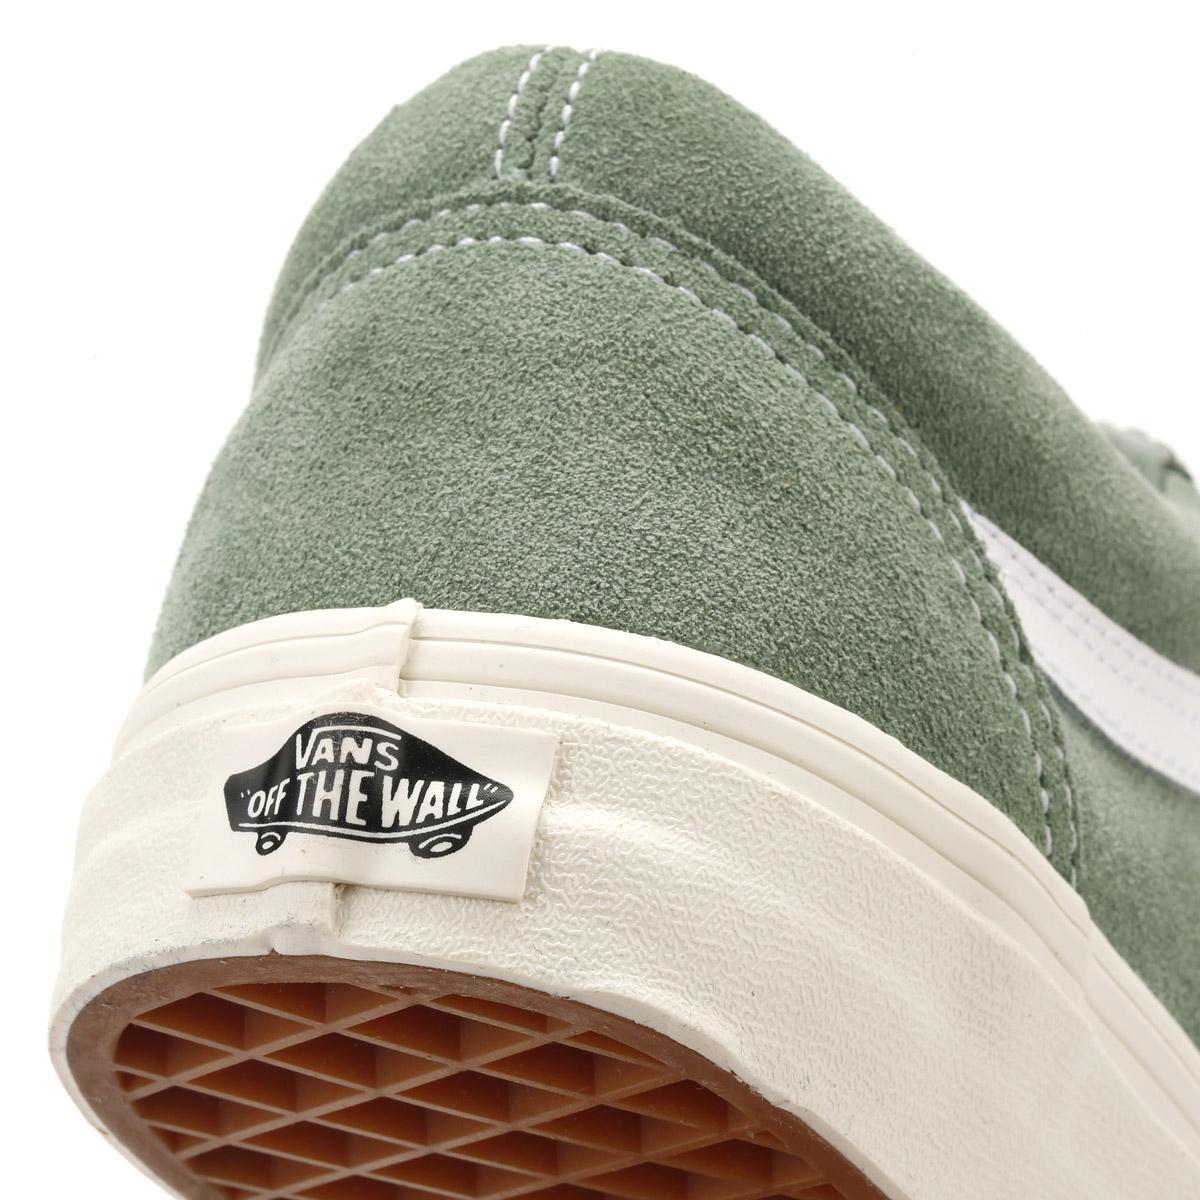 9999c29c8e Lyst - Vans Womens Green   True White Retro Sport Suede Old Skool ...